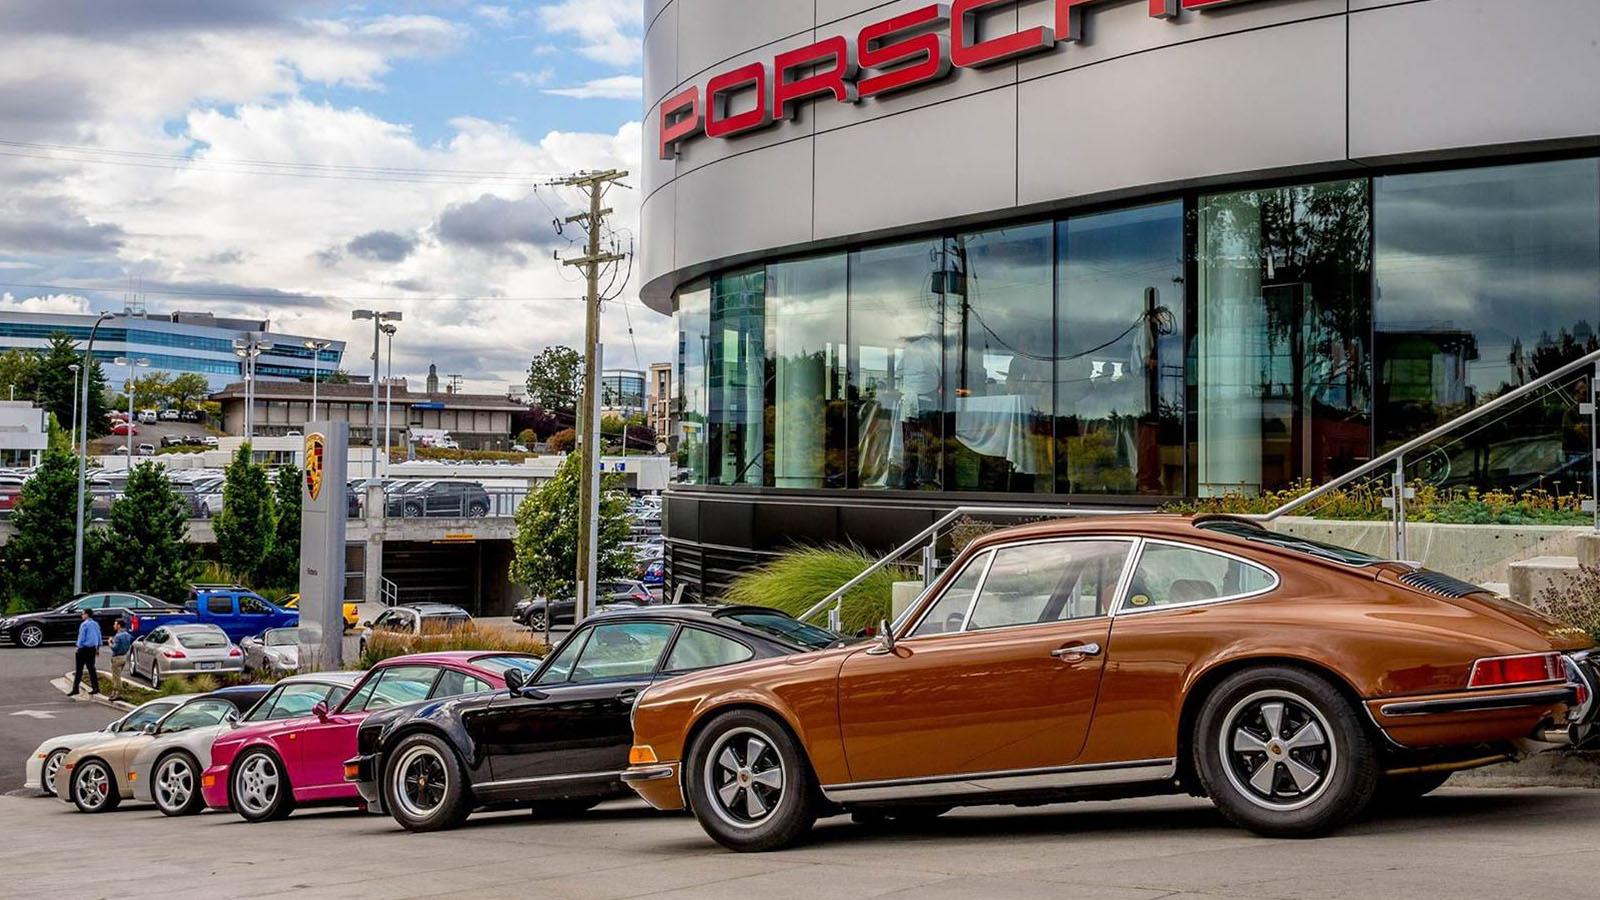 Porsche - Порше Центр Виктория